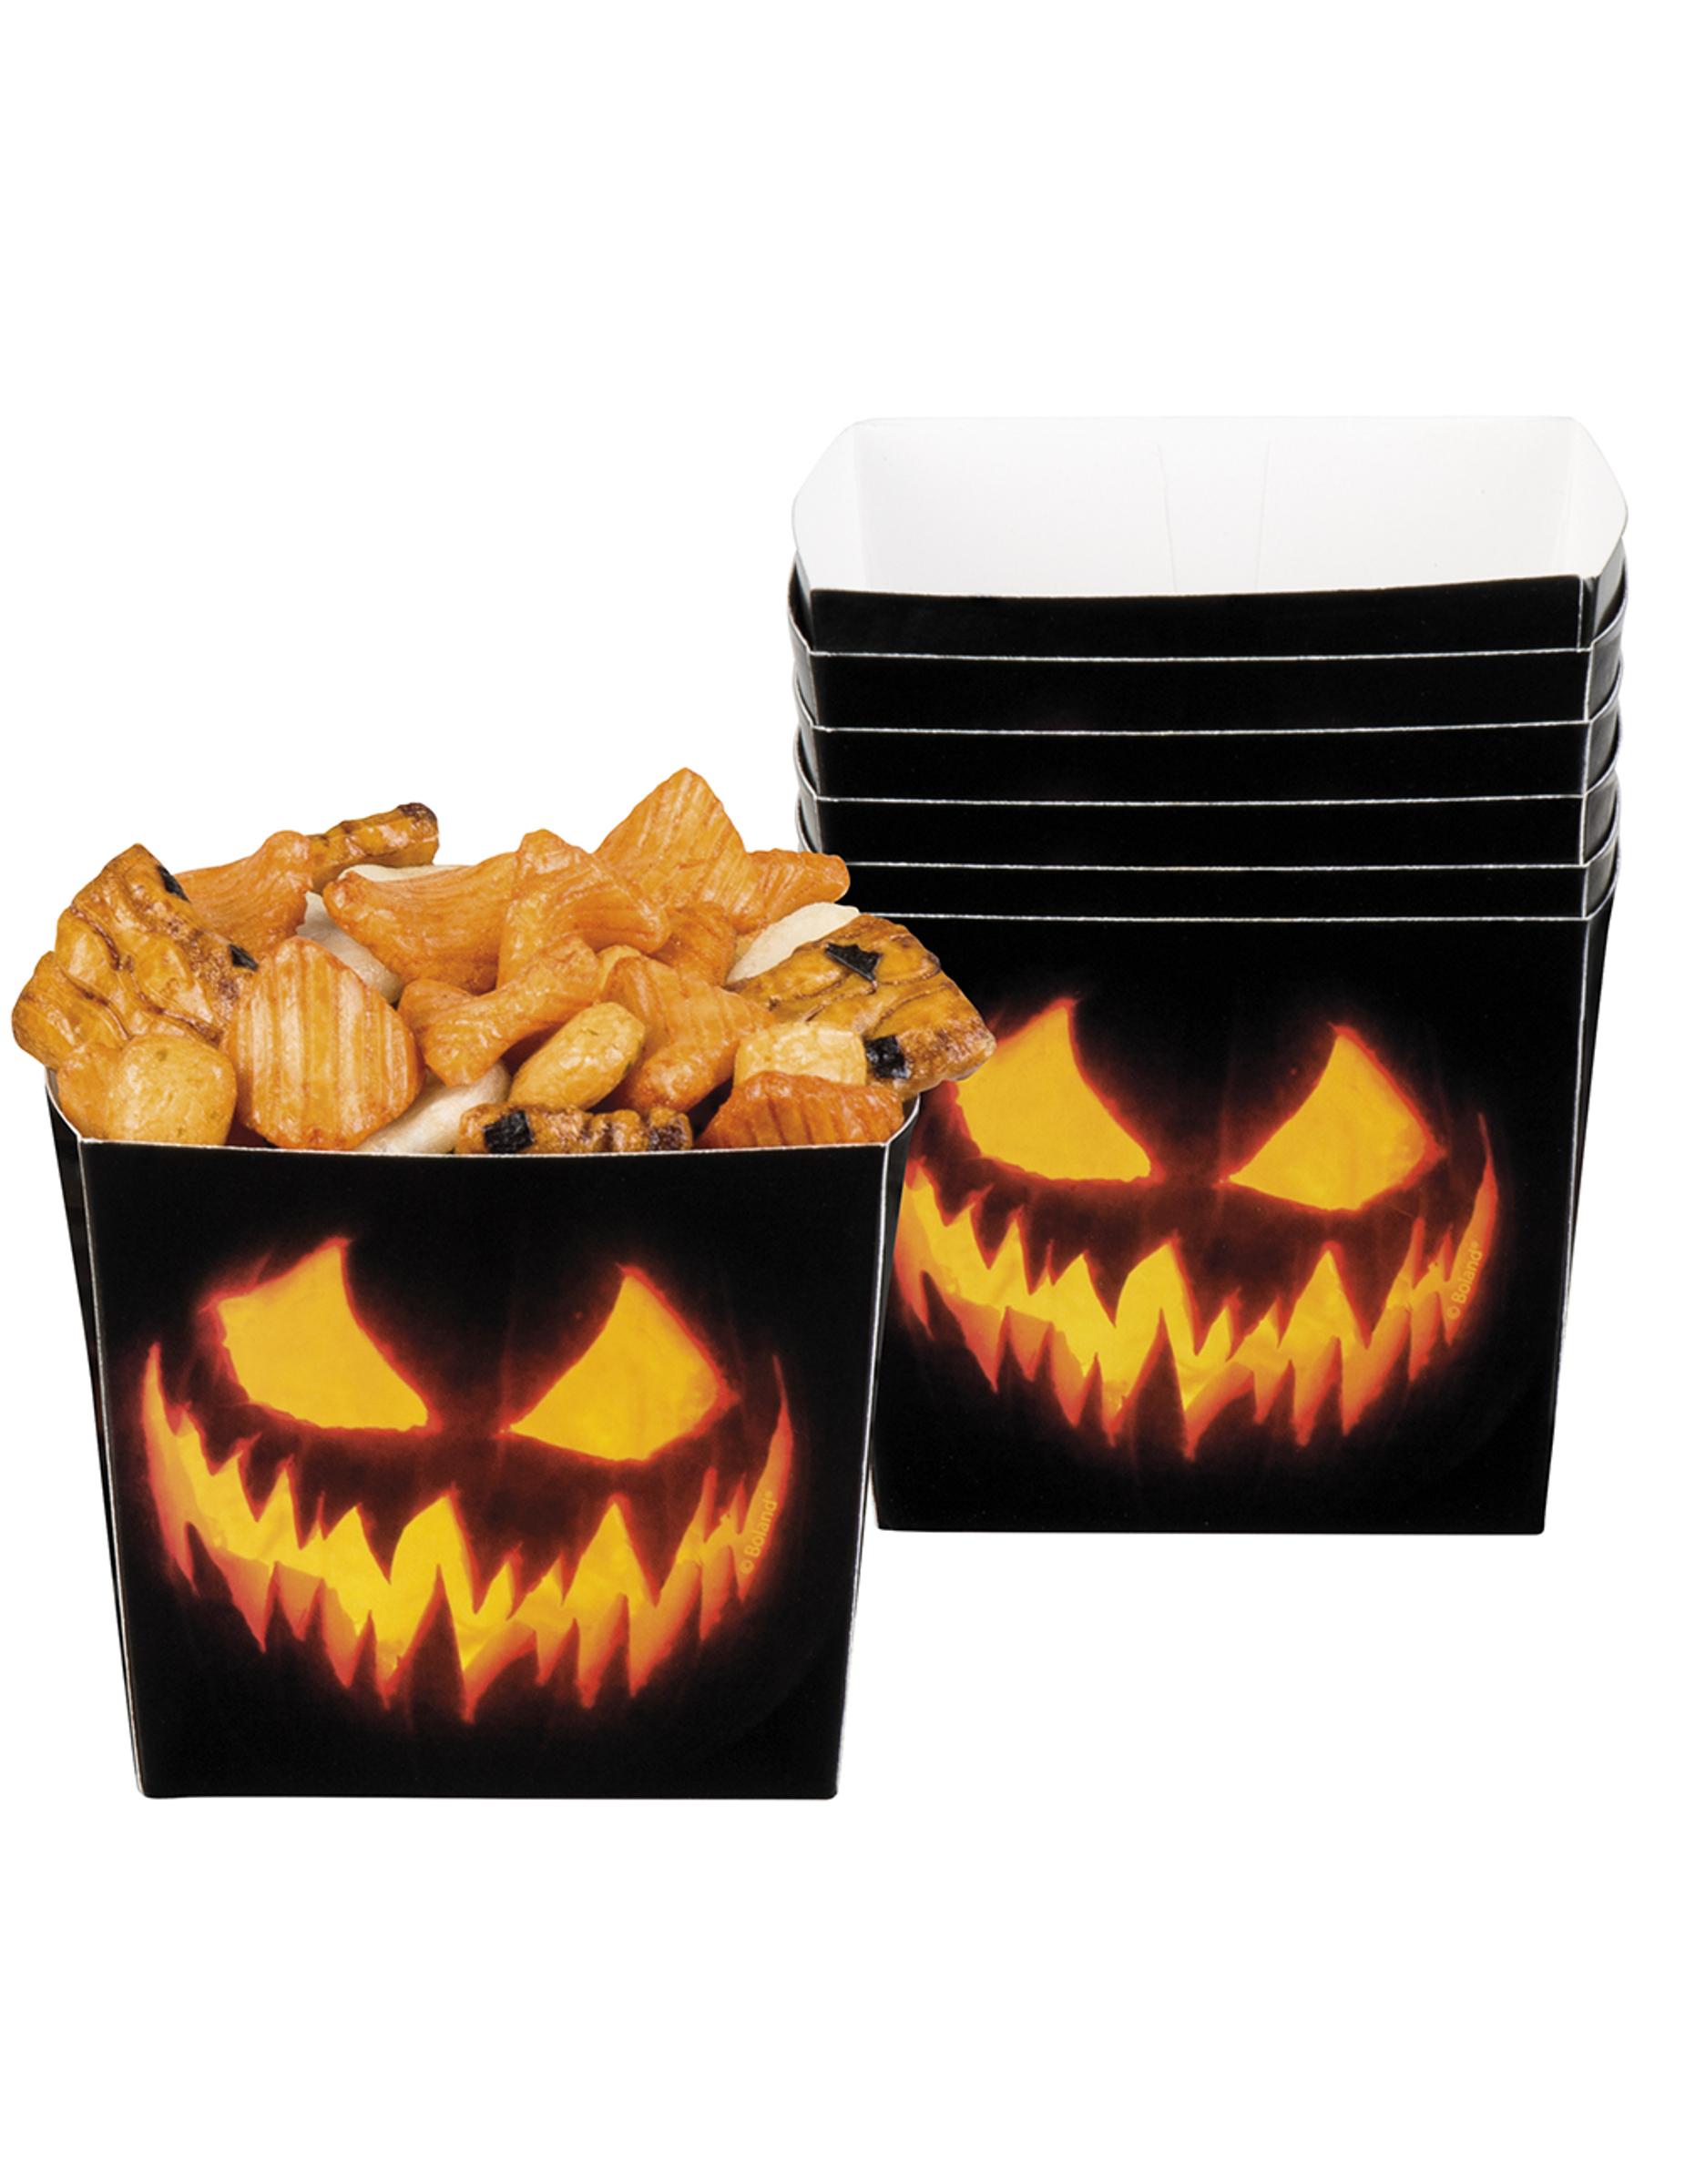 6 Kurbis Snackbehalter Halloween Dekoration Schwarz Orange 400ml Gunstige Faschings Partydeko Zubehor Bei Karneval Megastore